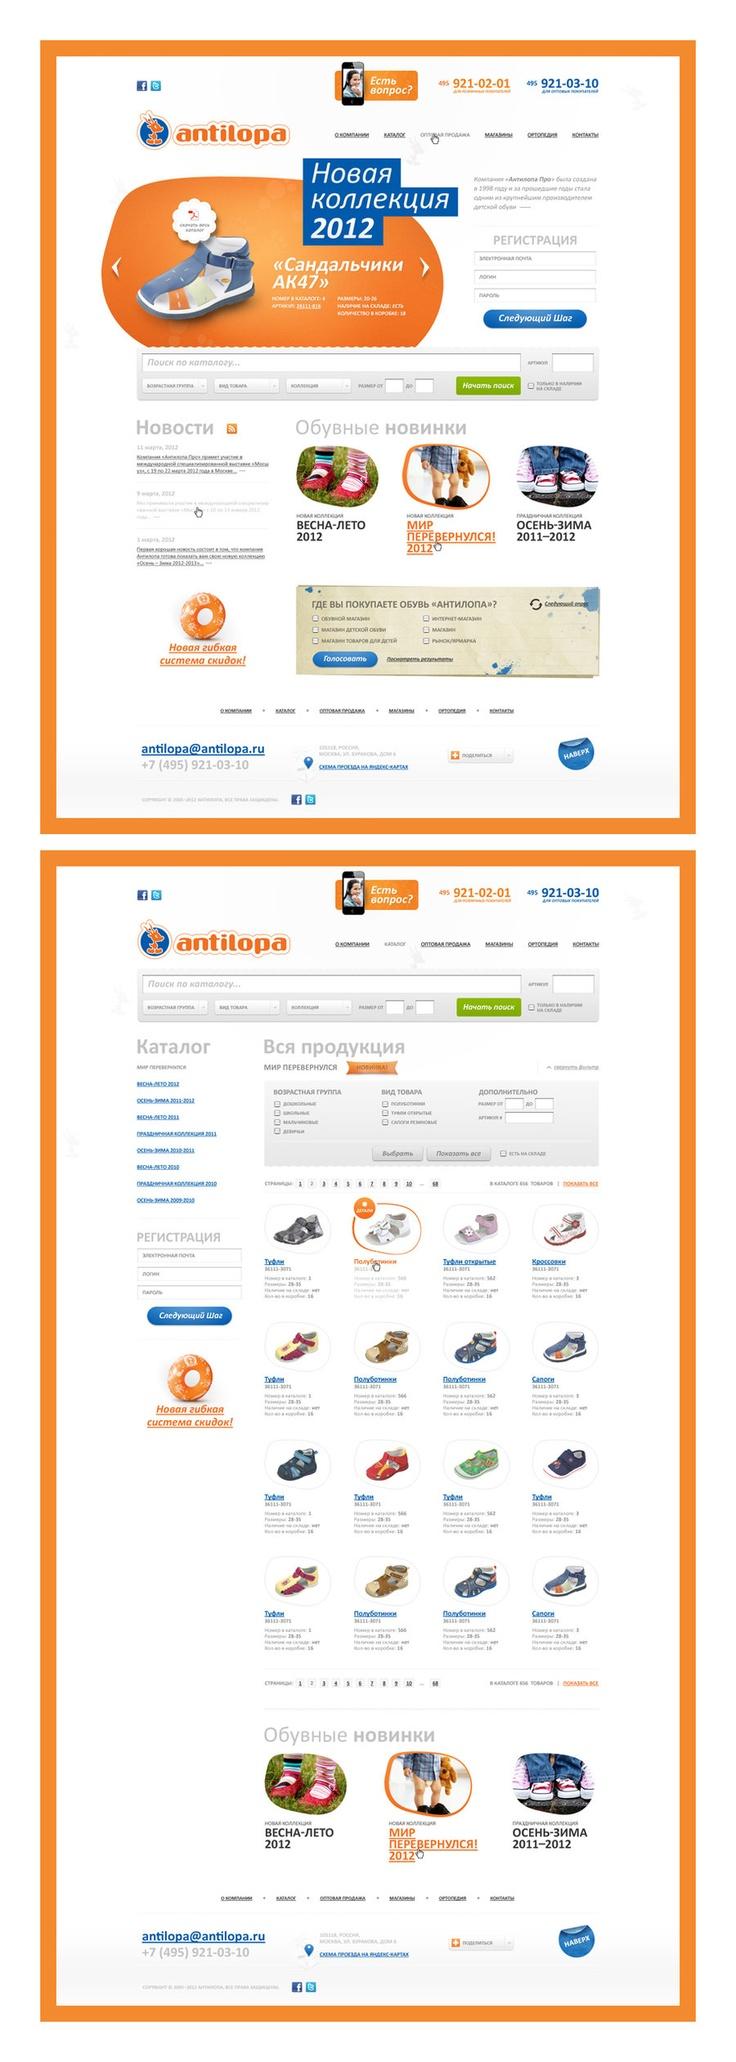 kid.boot.store. by nuwman.deviantart.com on @deviantART #ecommerce #e-commerce #commerce #design #web #webdesign #layout #shop #online #store